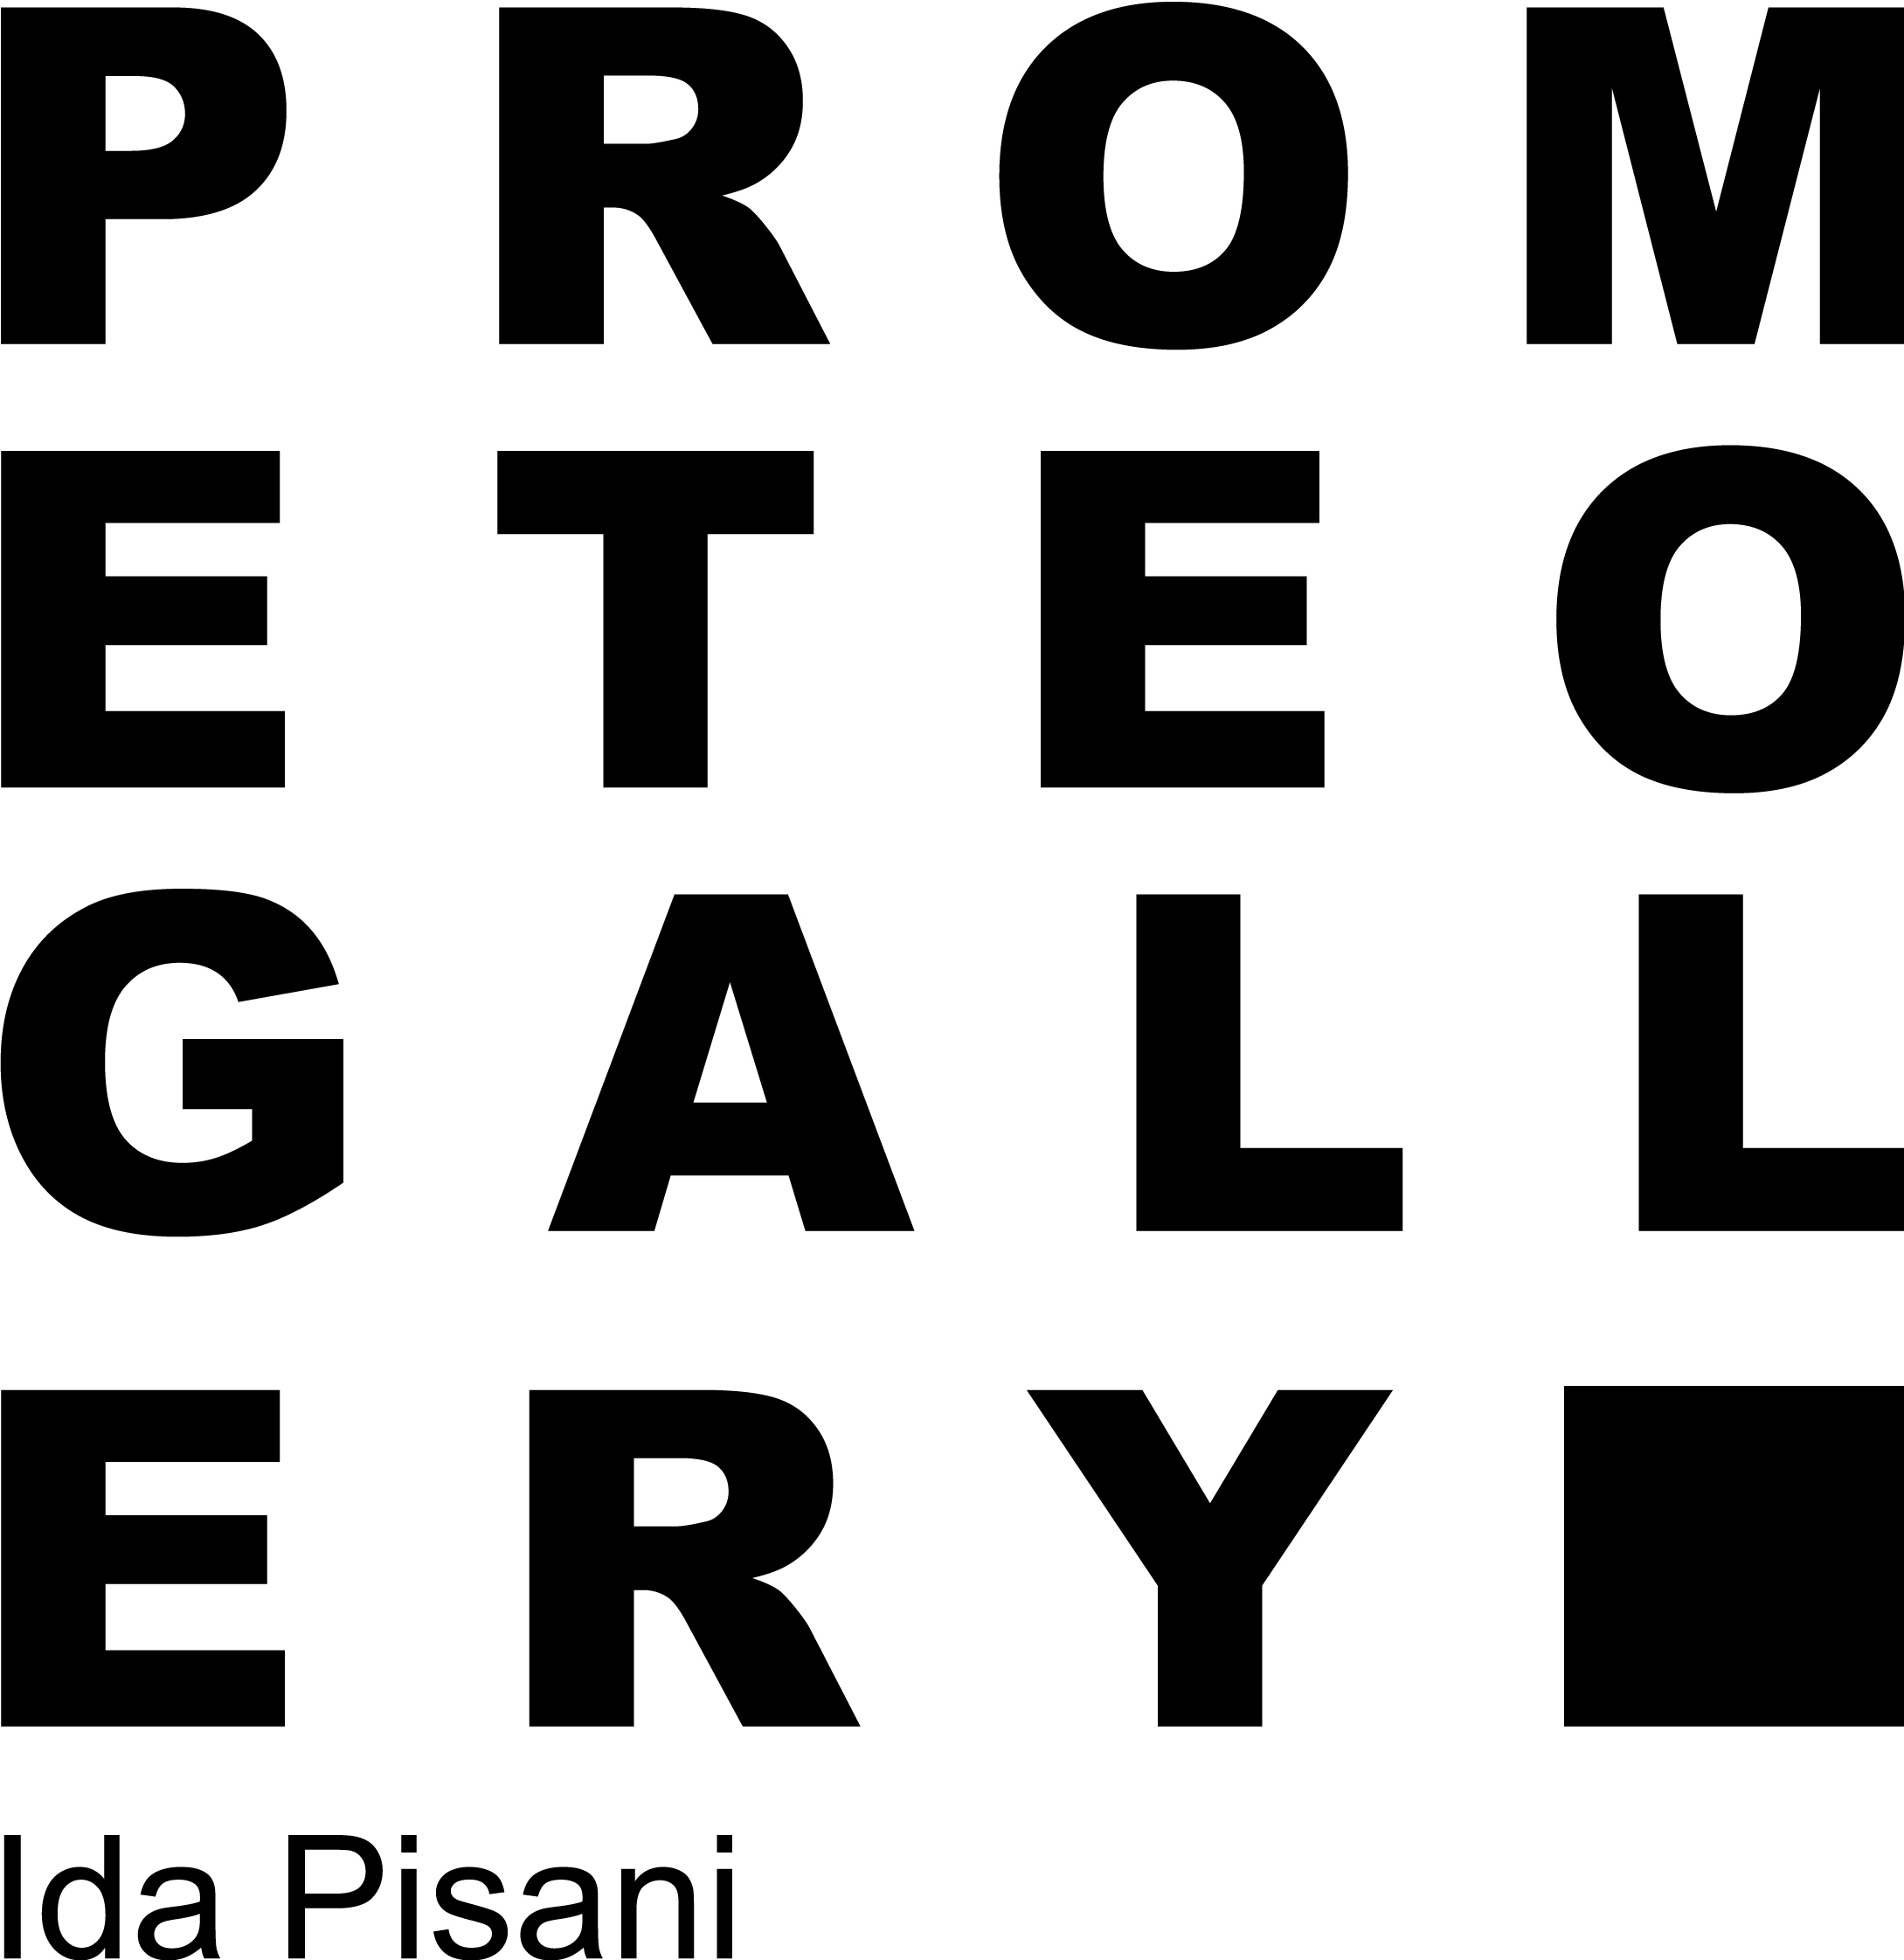 Prometeo Gallery Ida Pisani